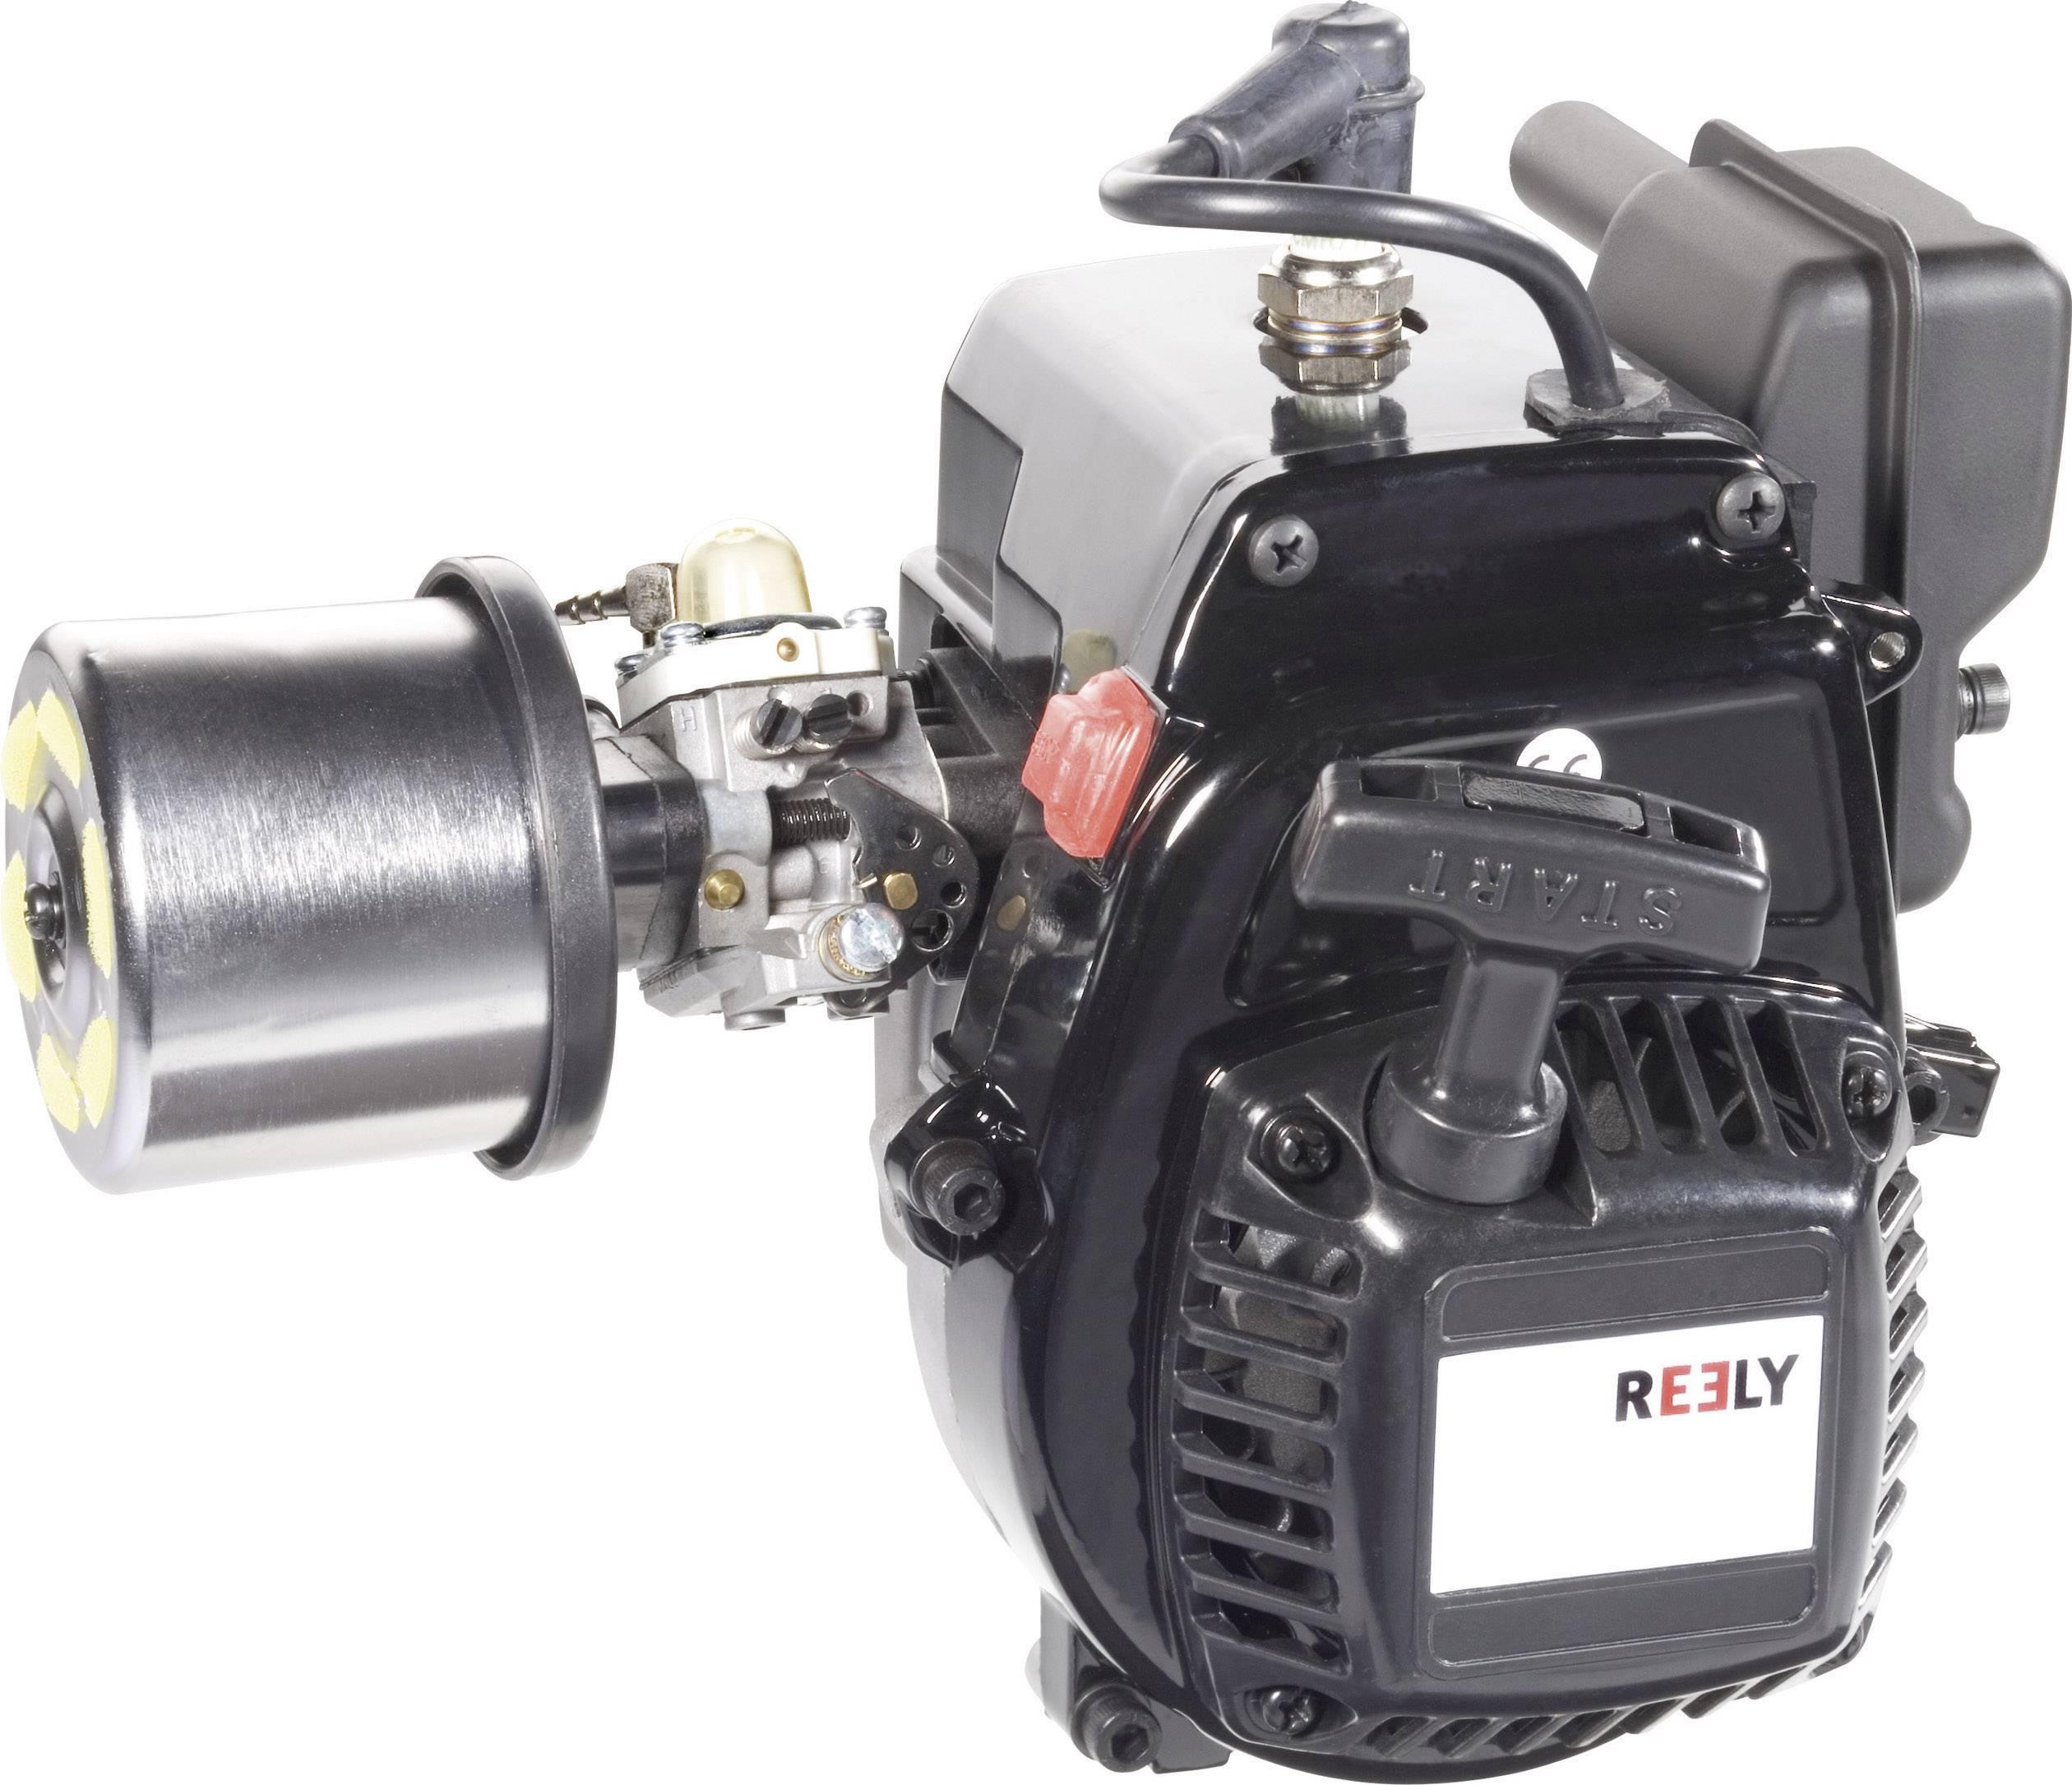 Reely CF-26 Benzine 2-takt automotor 26 cm³ 1.6 pk 1.18 kW